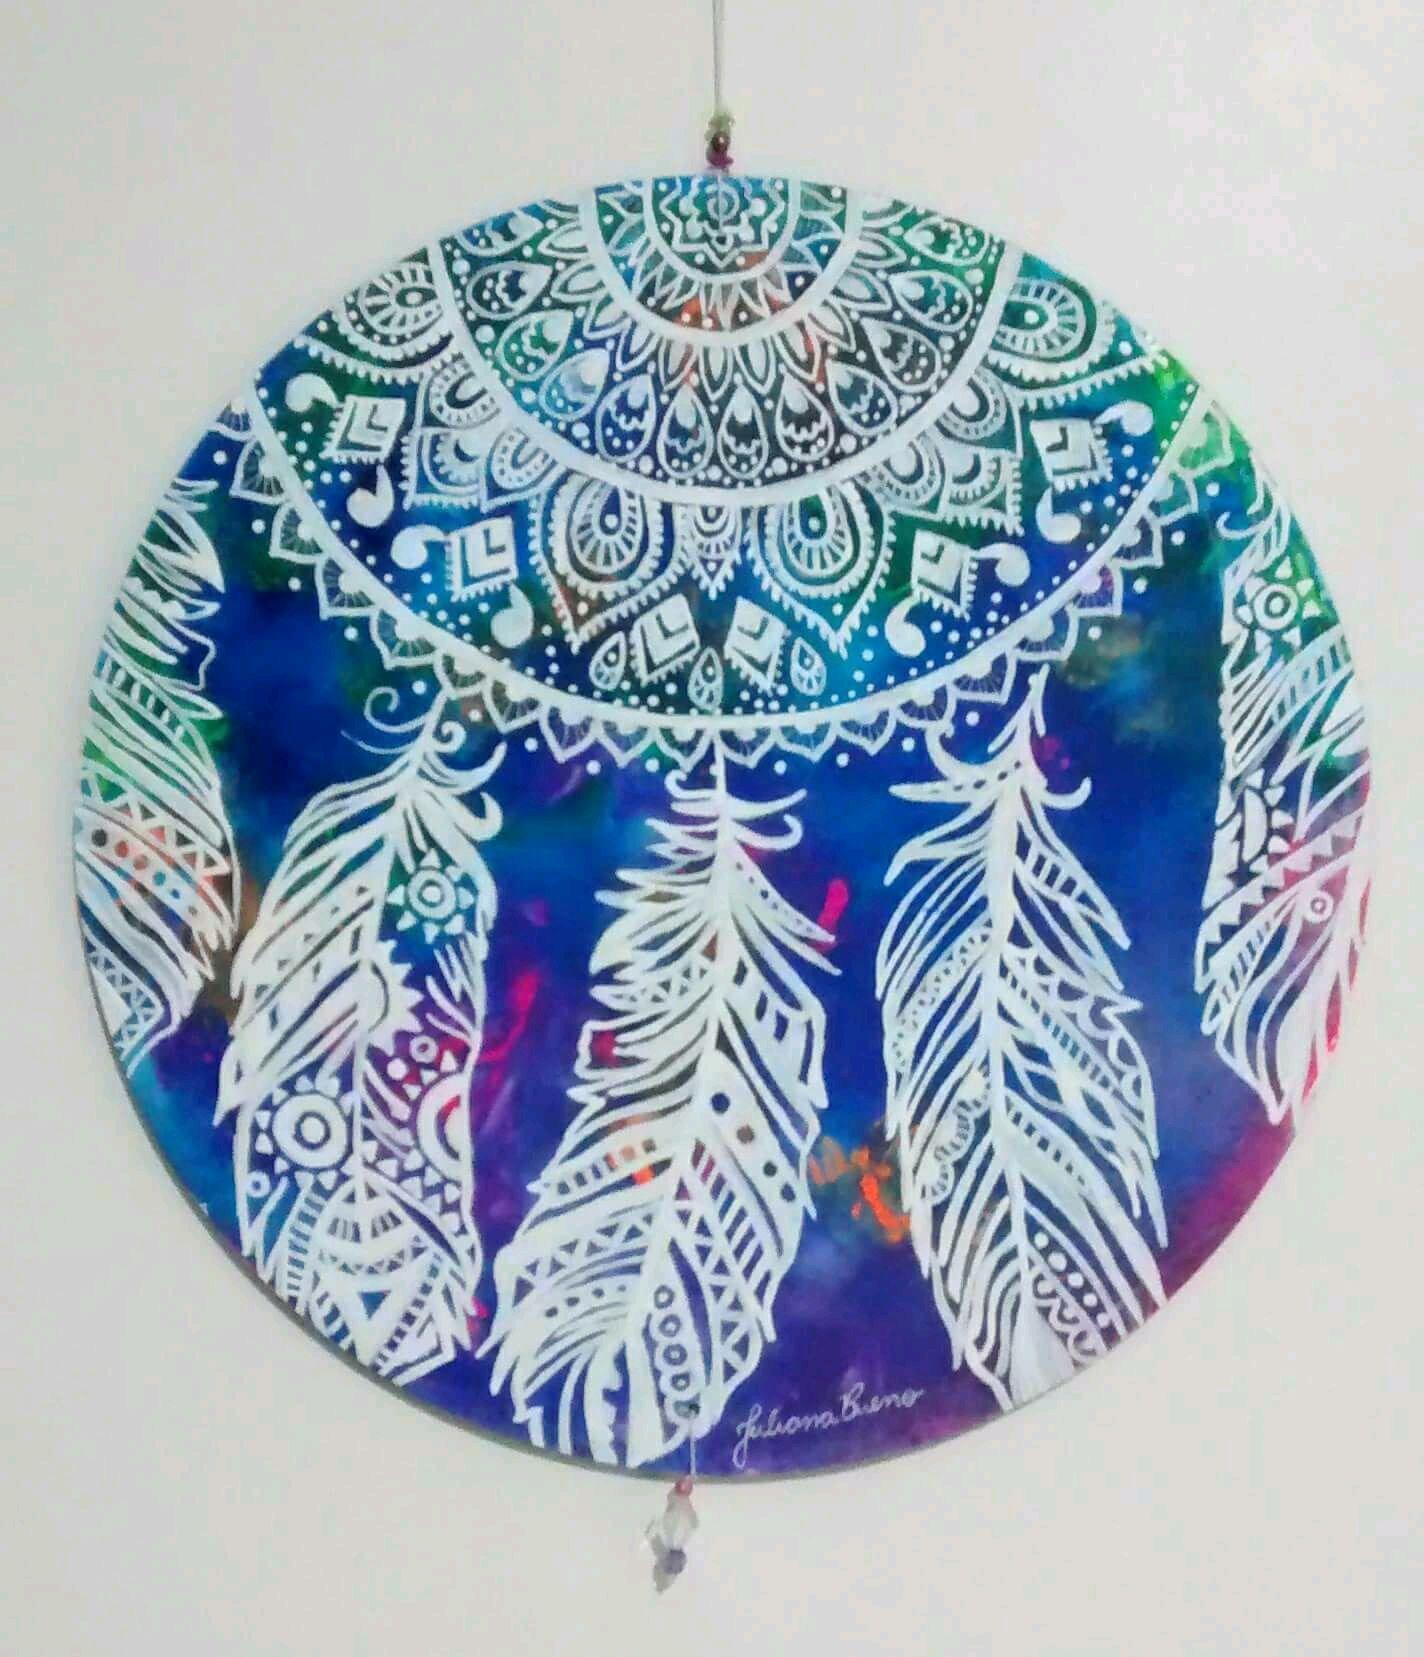 Pintura Em Vinil Mandala Filtro Dos Sonhos No Elo7 Juliana